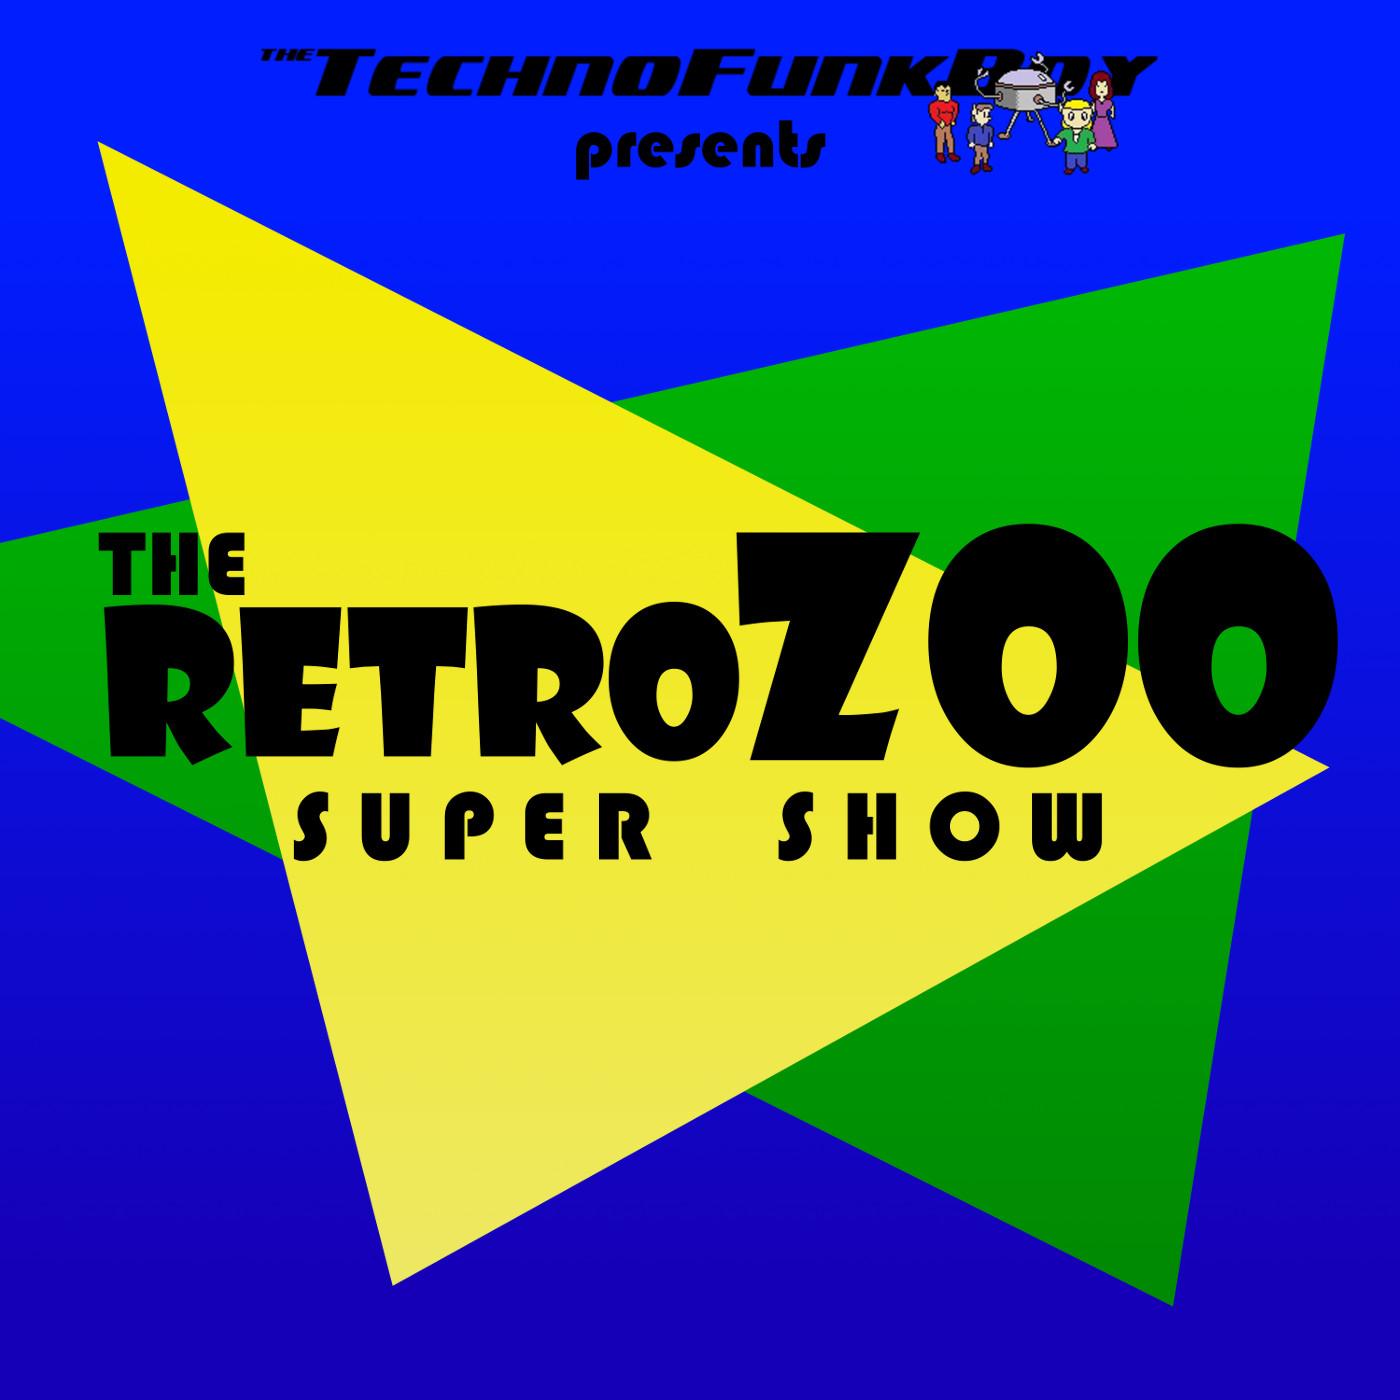 The Retro Zoo Super Show! show art